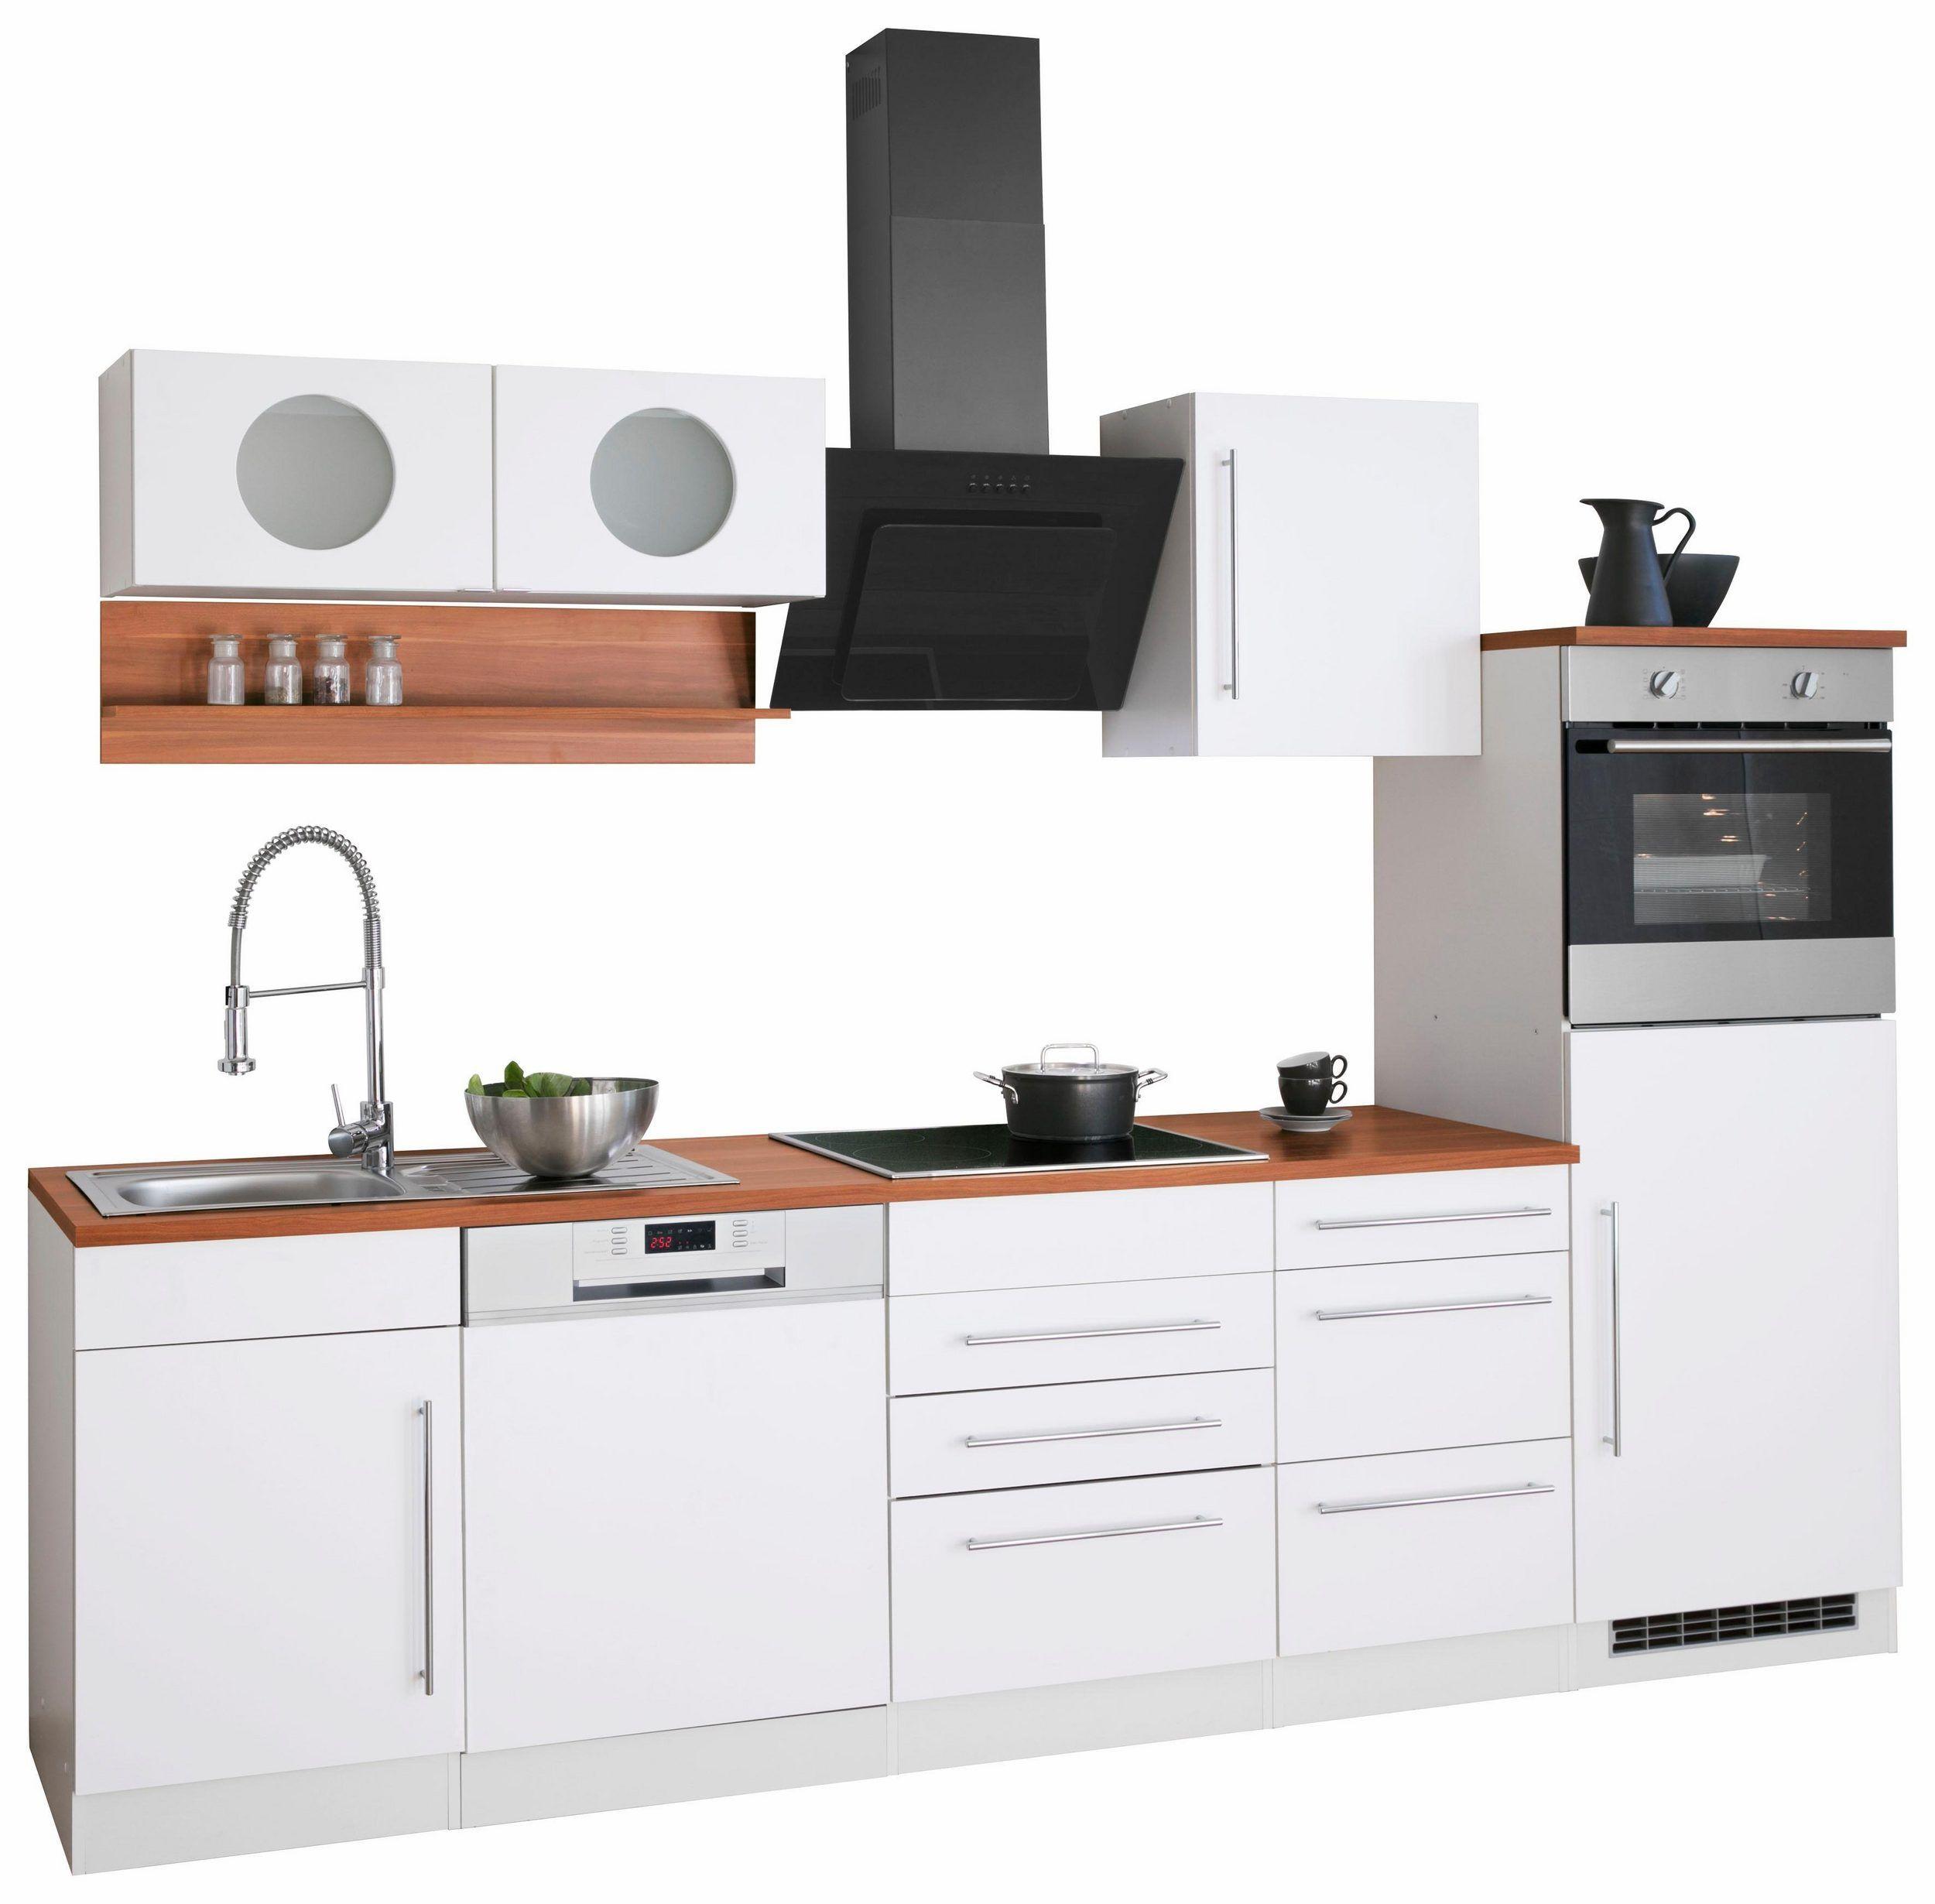 HELD MÖBEL Kitchen IShape, HELD Kitchen